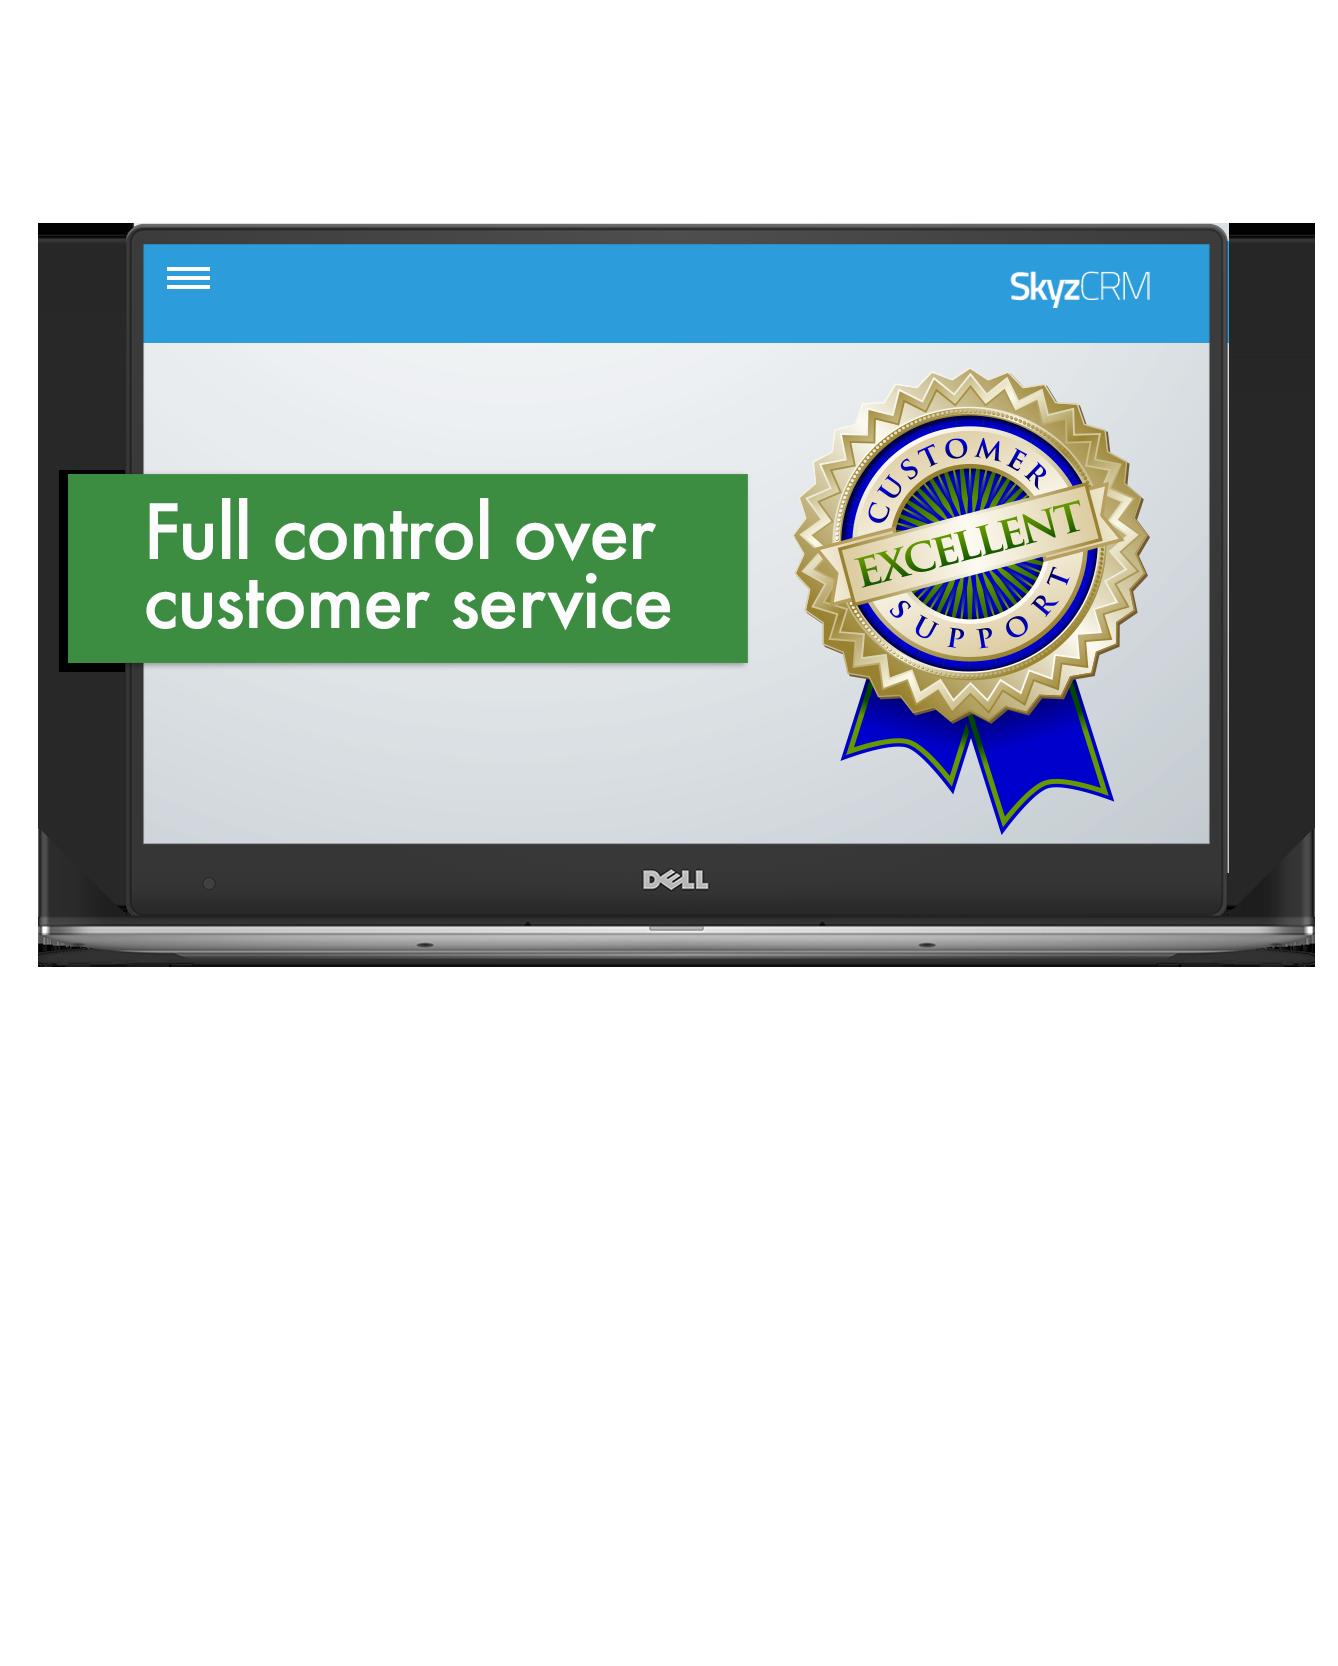 Customer service control with Skyz CRM